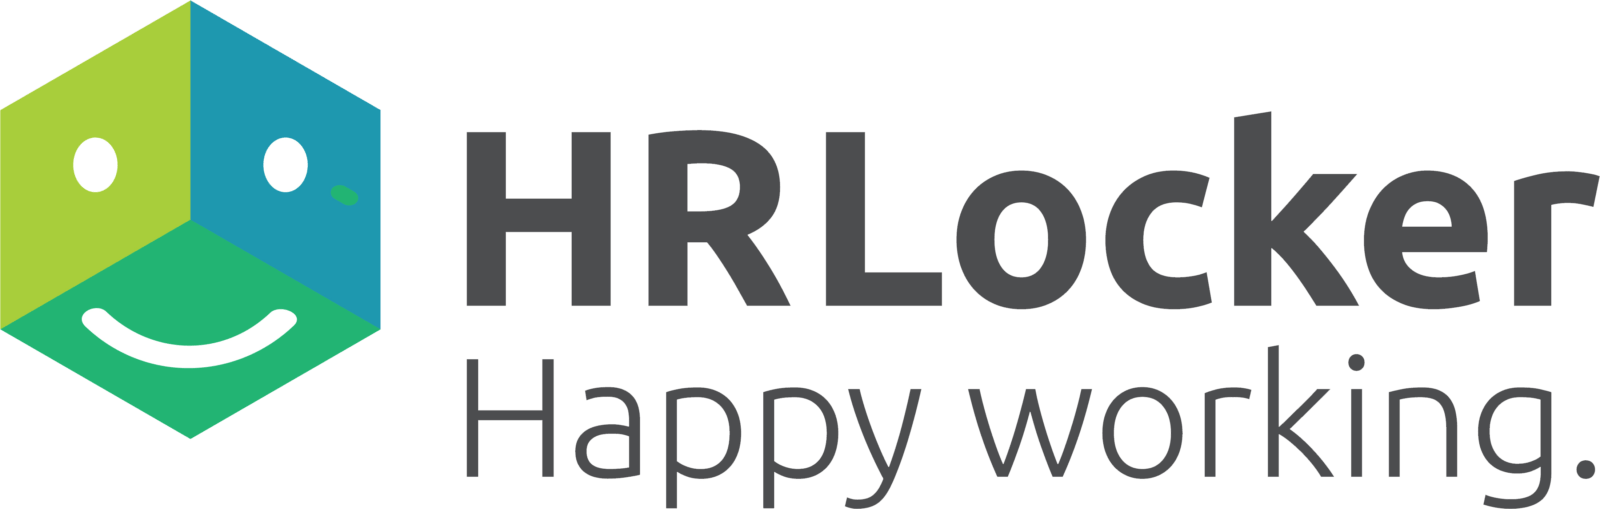 HRLocker logo